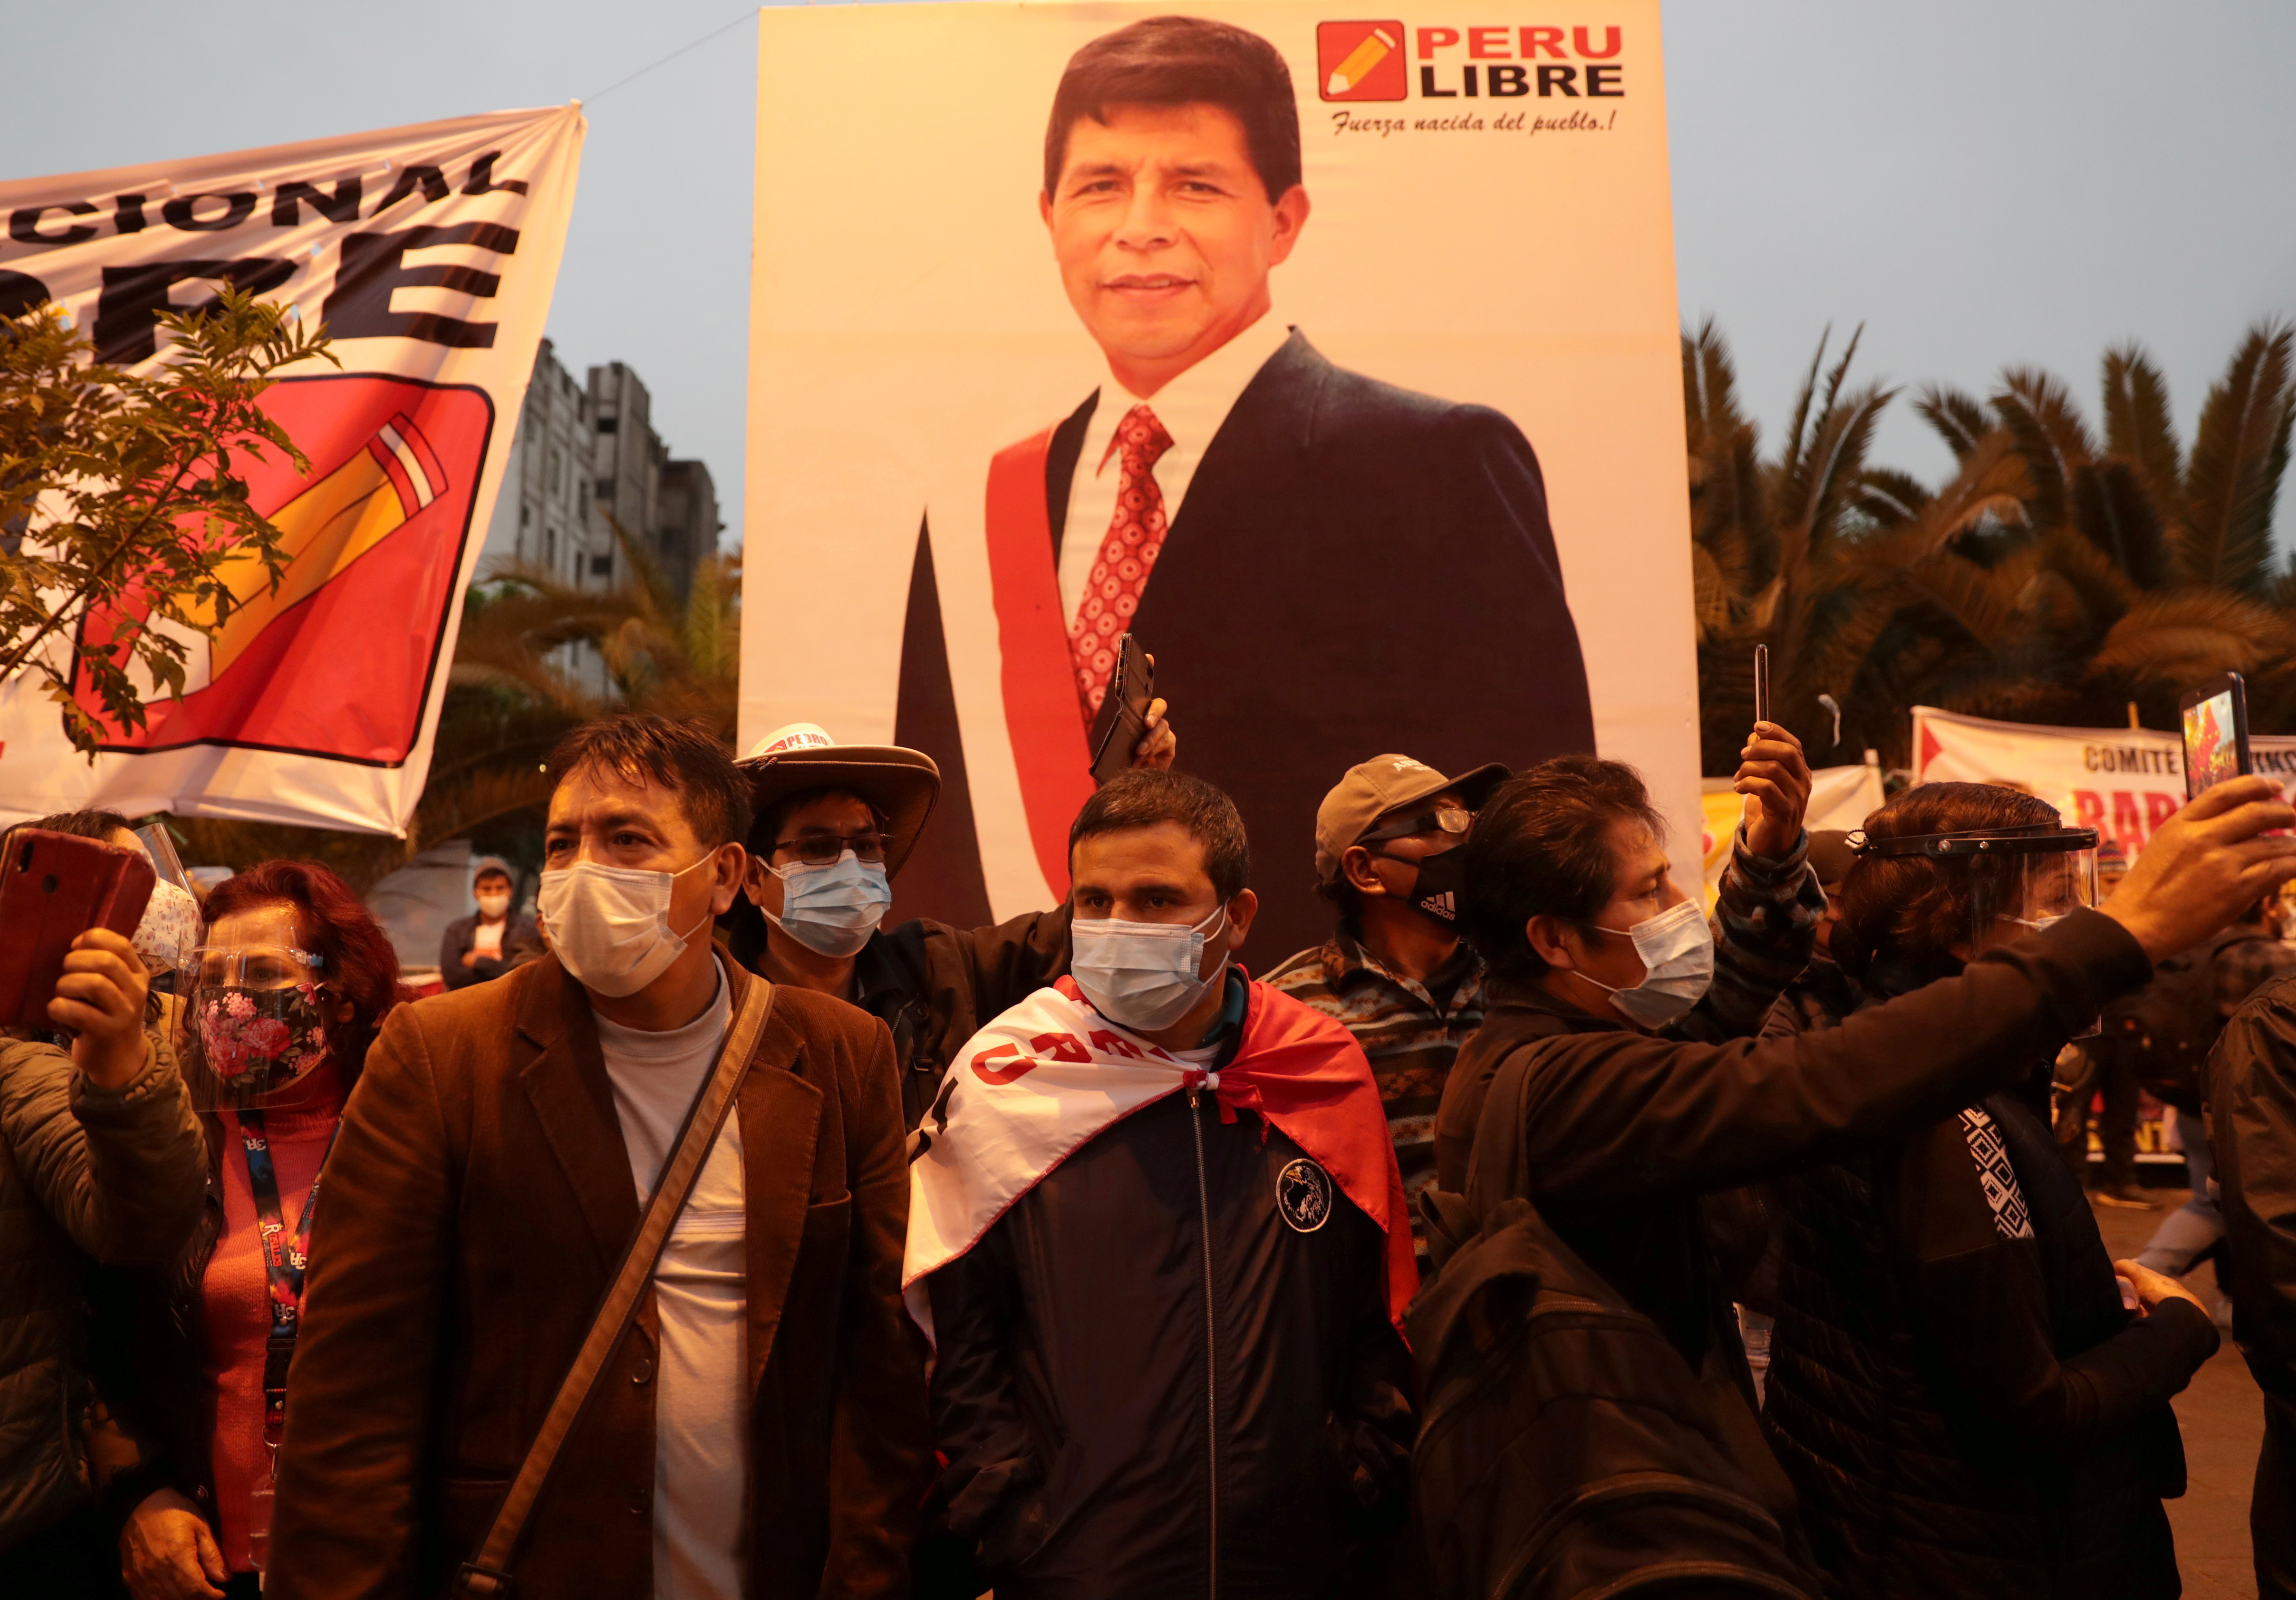 Supporters of Peru's presidential candidate Pedro Castillo gather in Lima, Peru June 19, 2021. REUTERS/Sebastian Castaneda